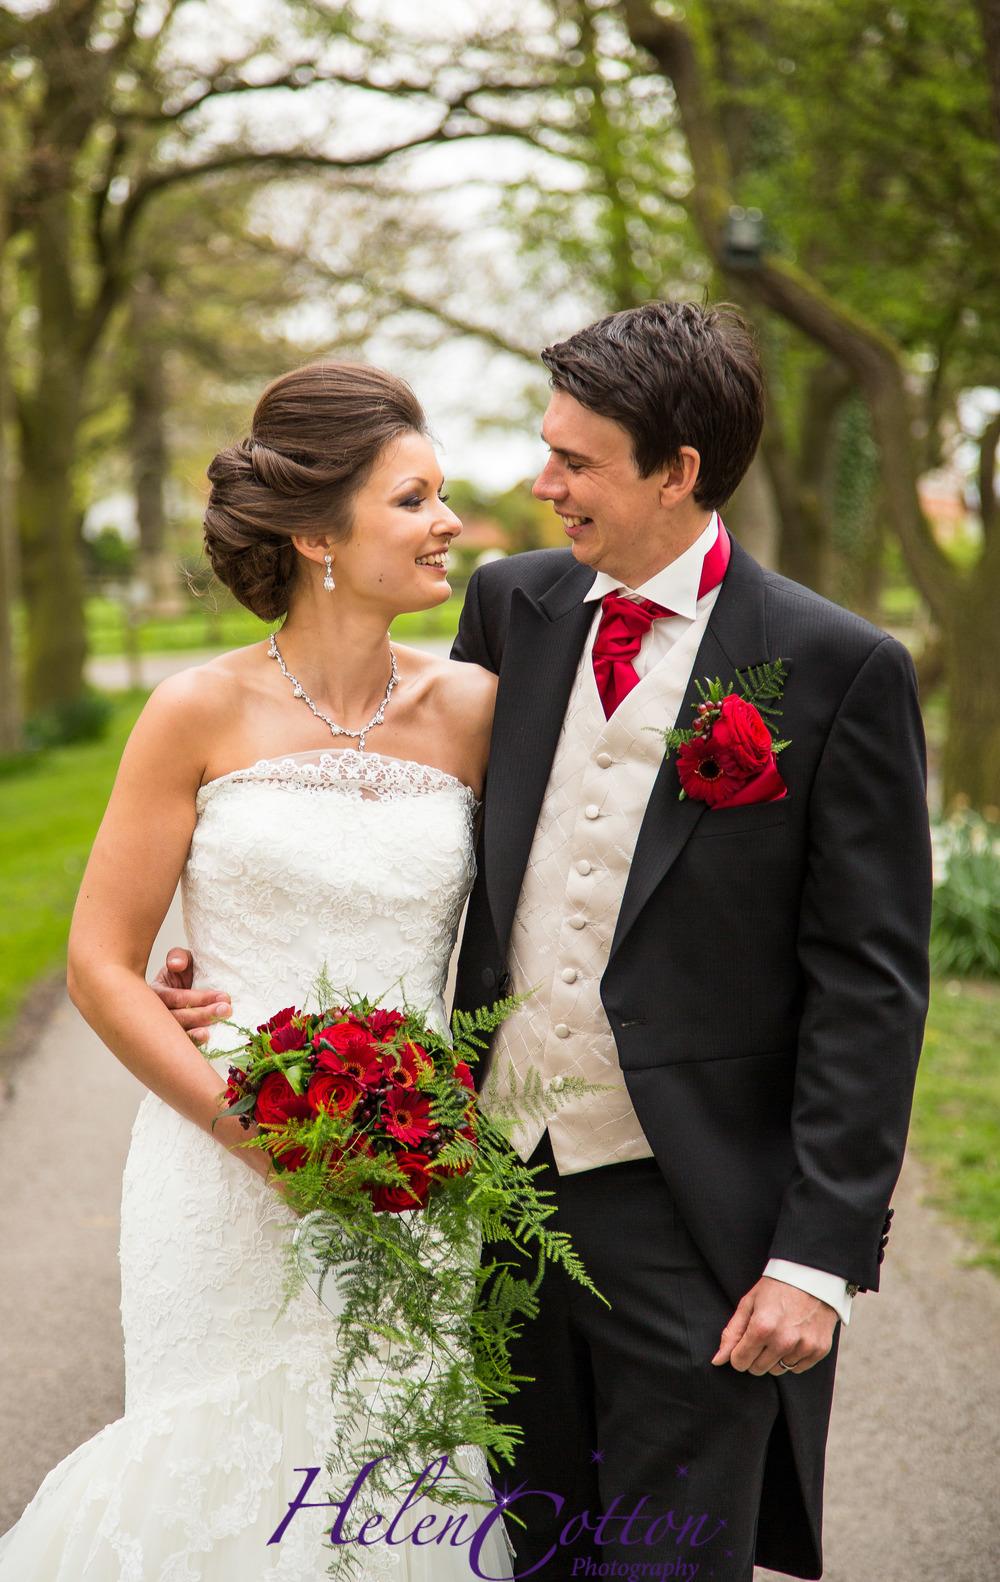 Sian & Rob's Wedding_Helen Cotton Photography©-1184.JPG